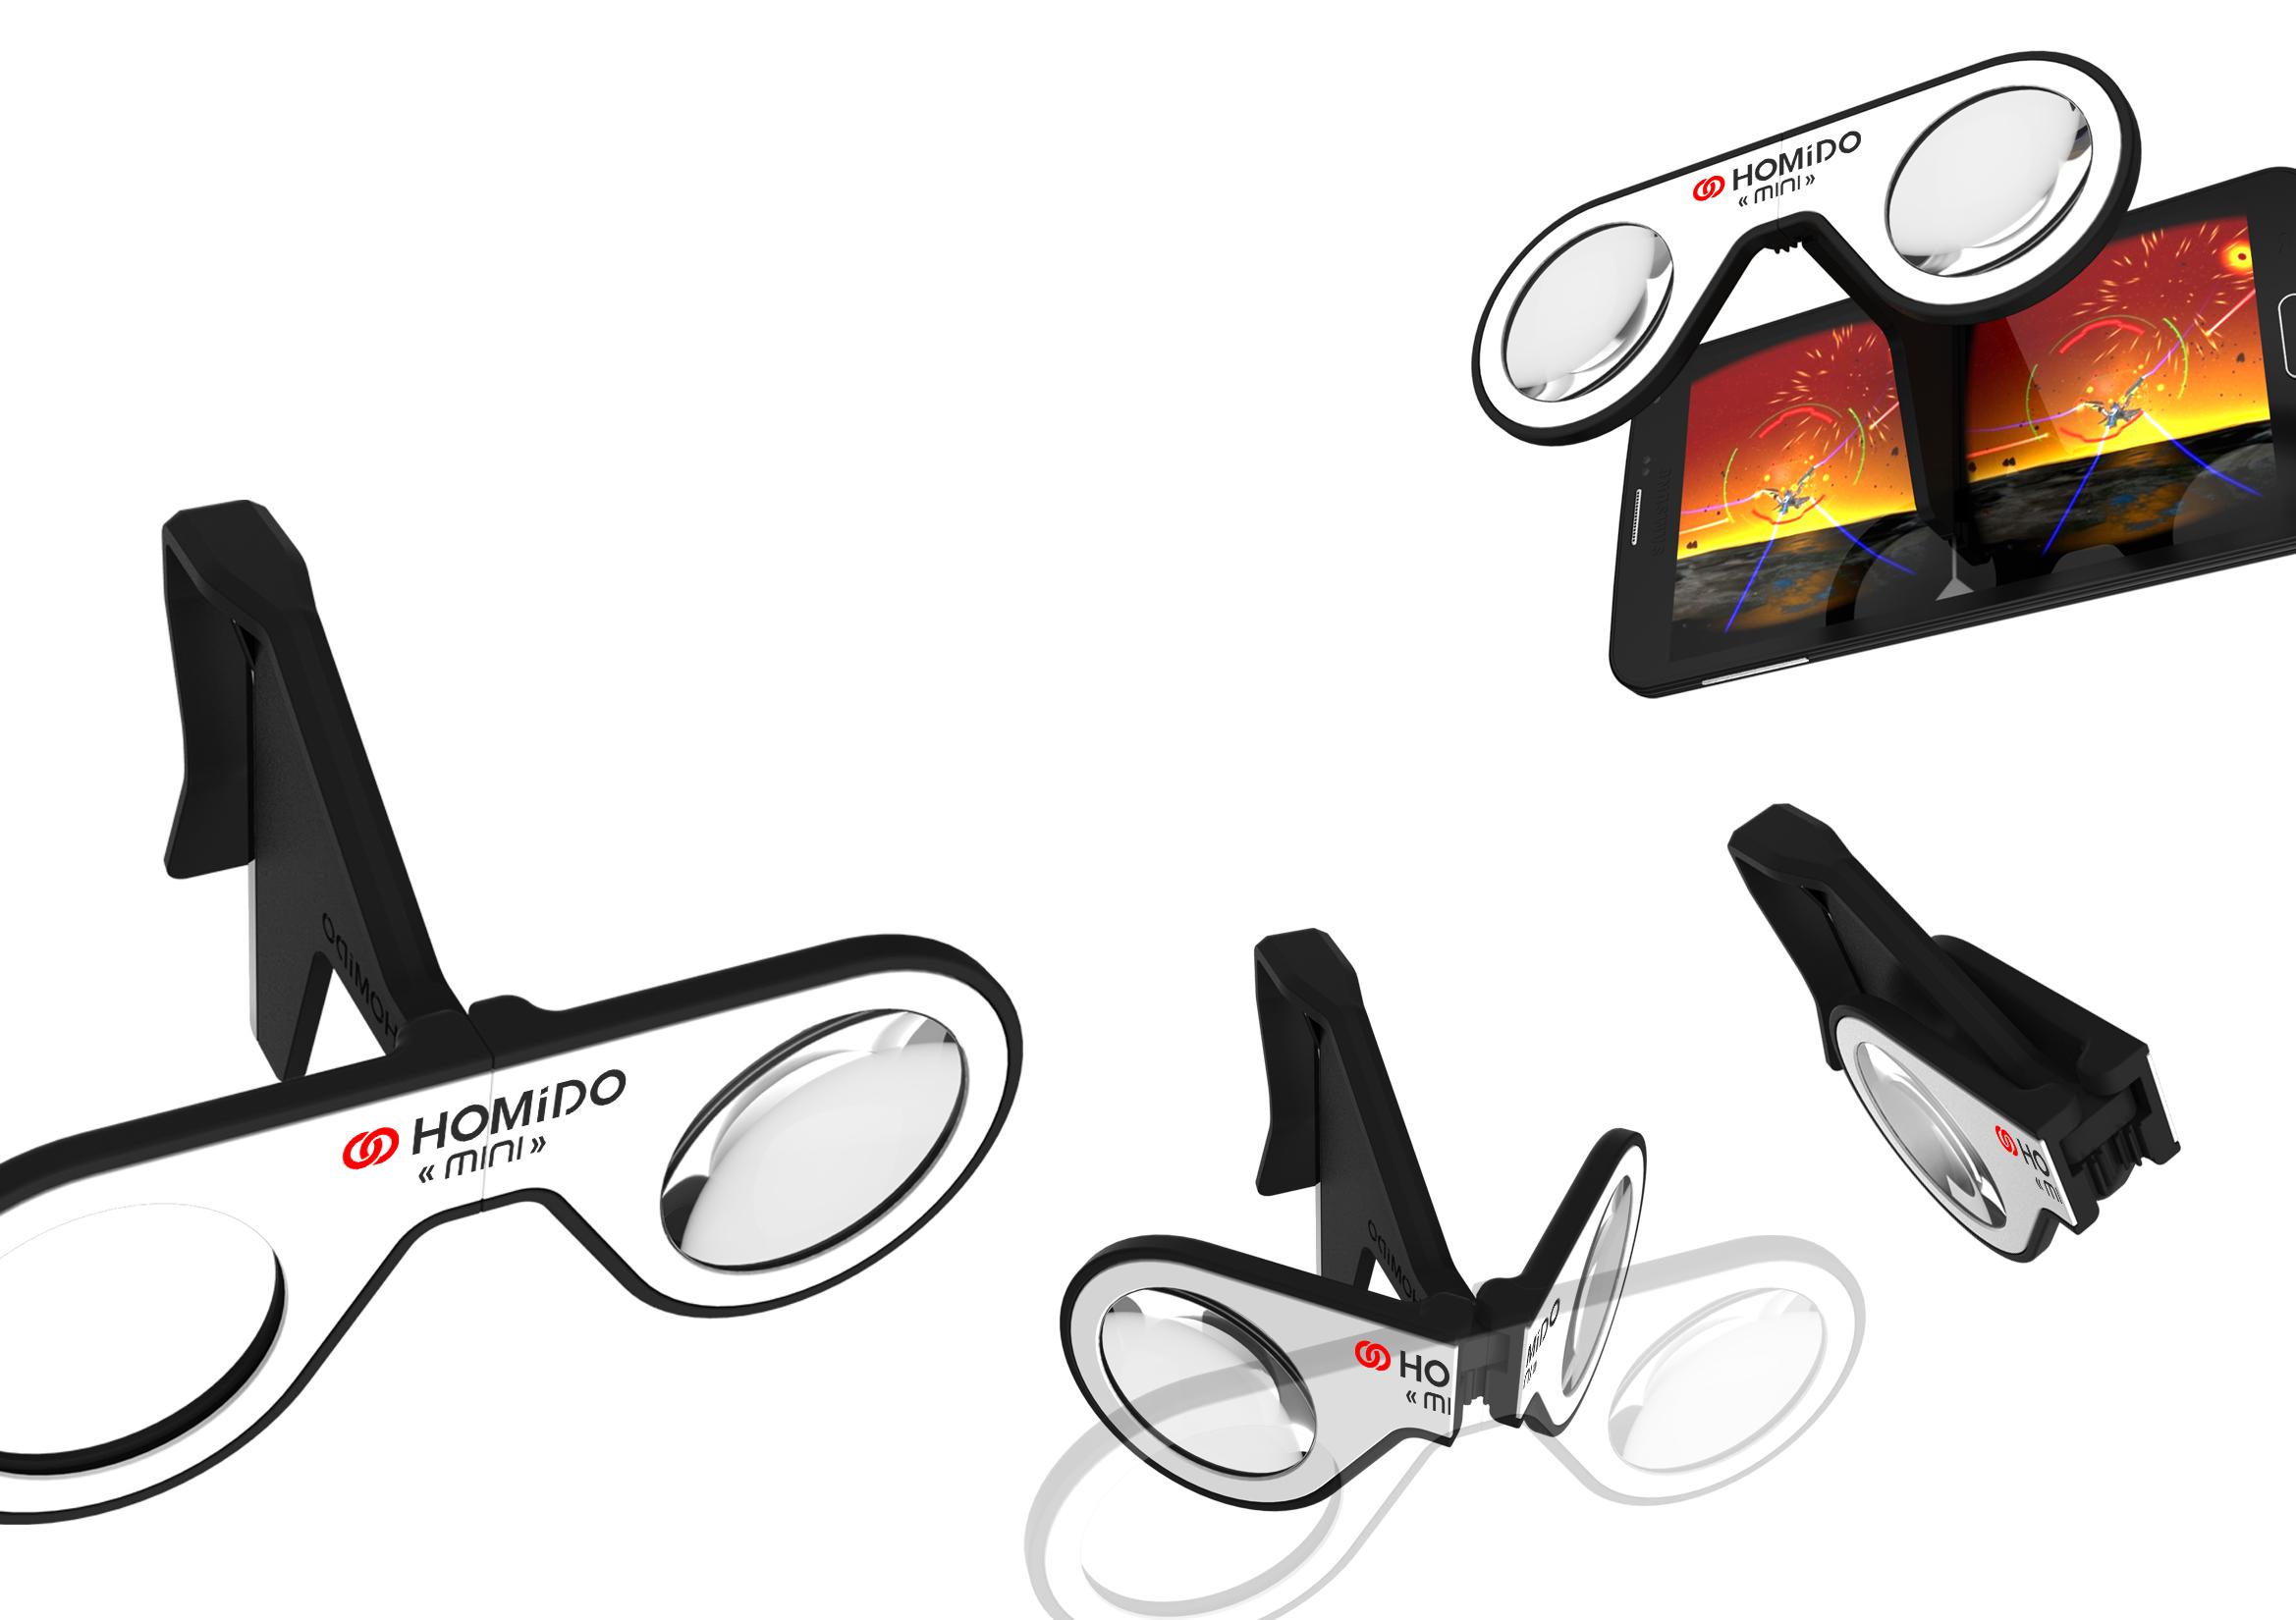 Homido-Mini-VR-lunettes (1)